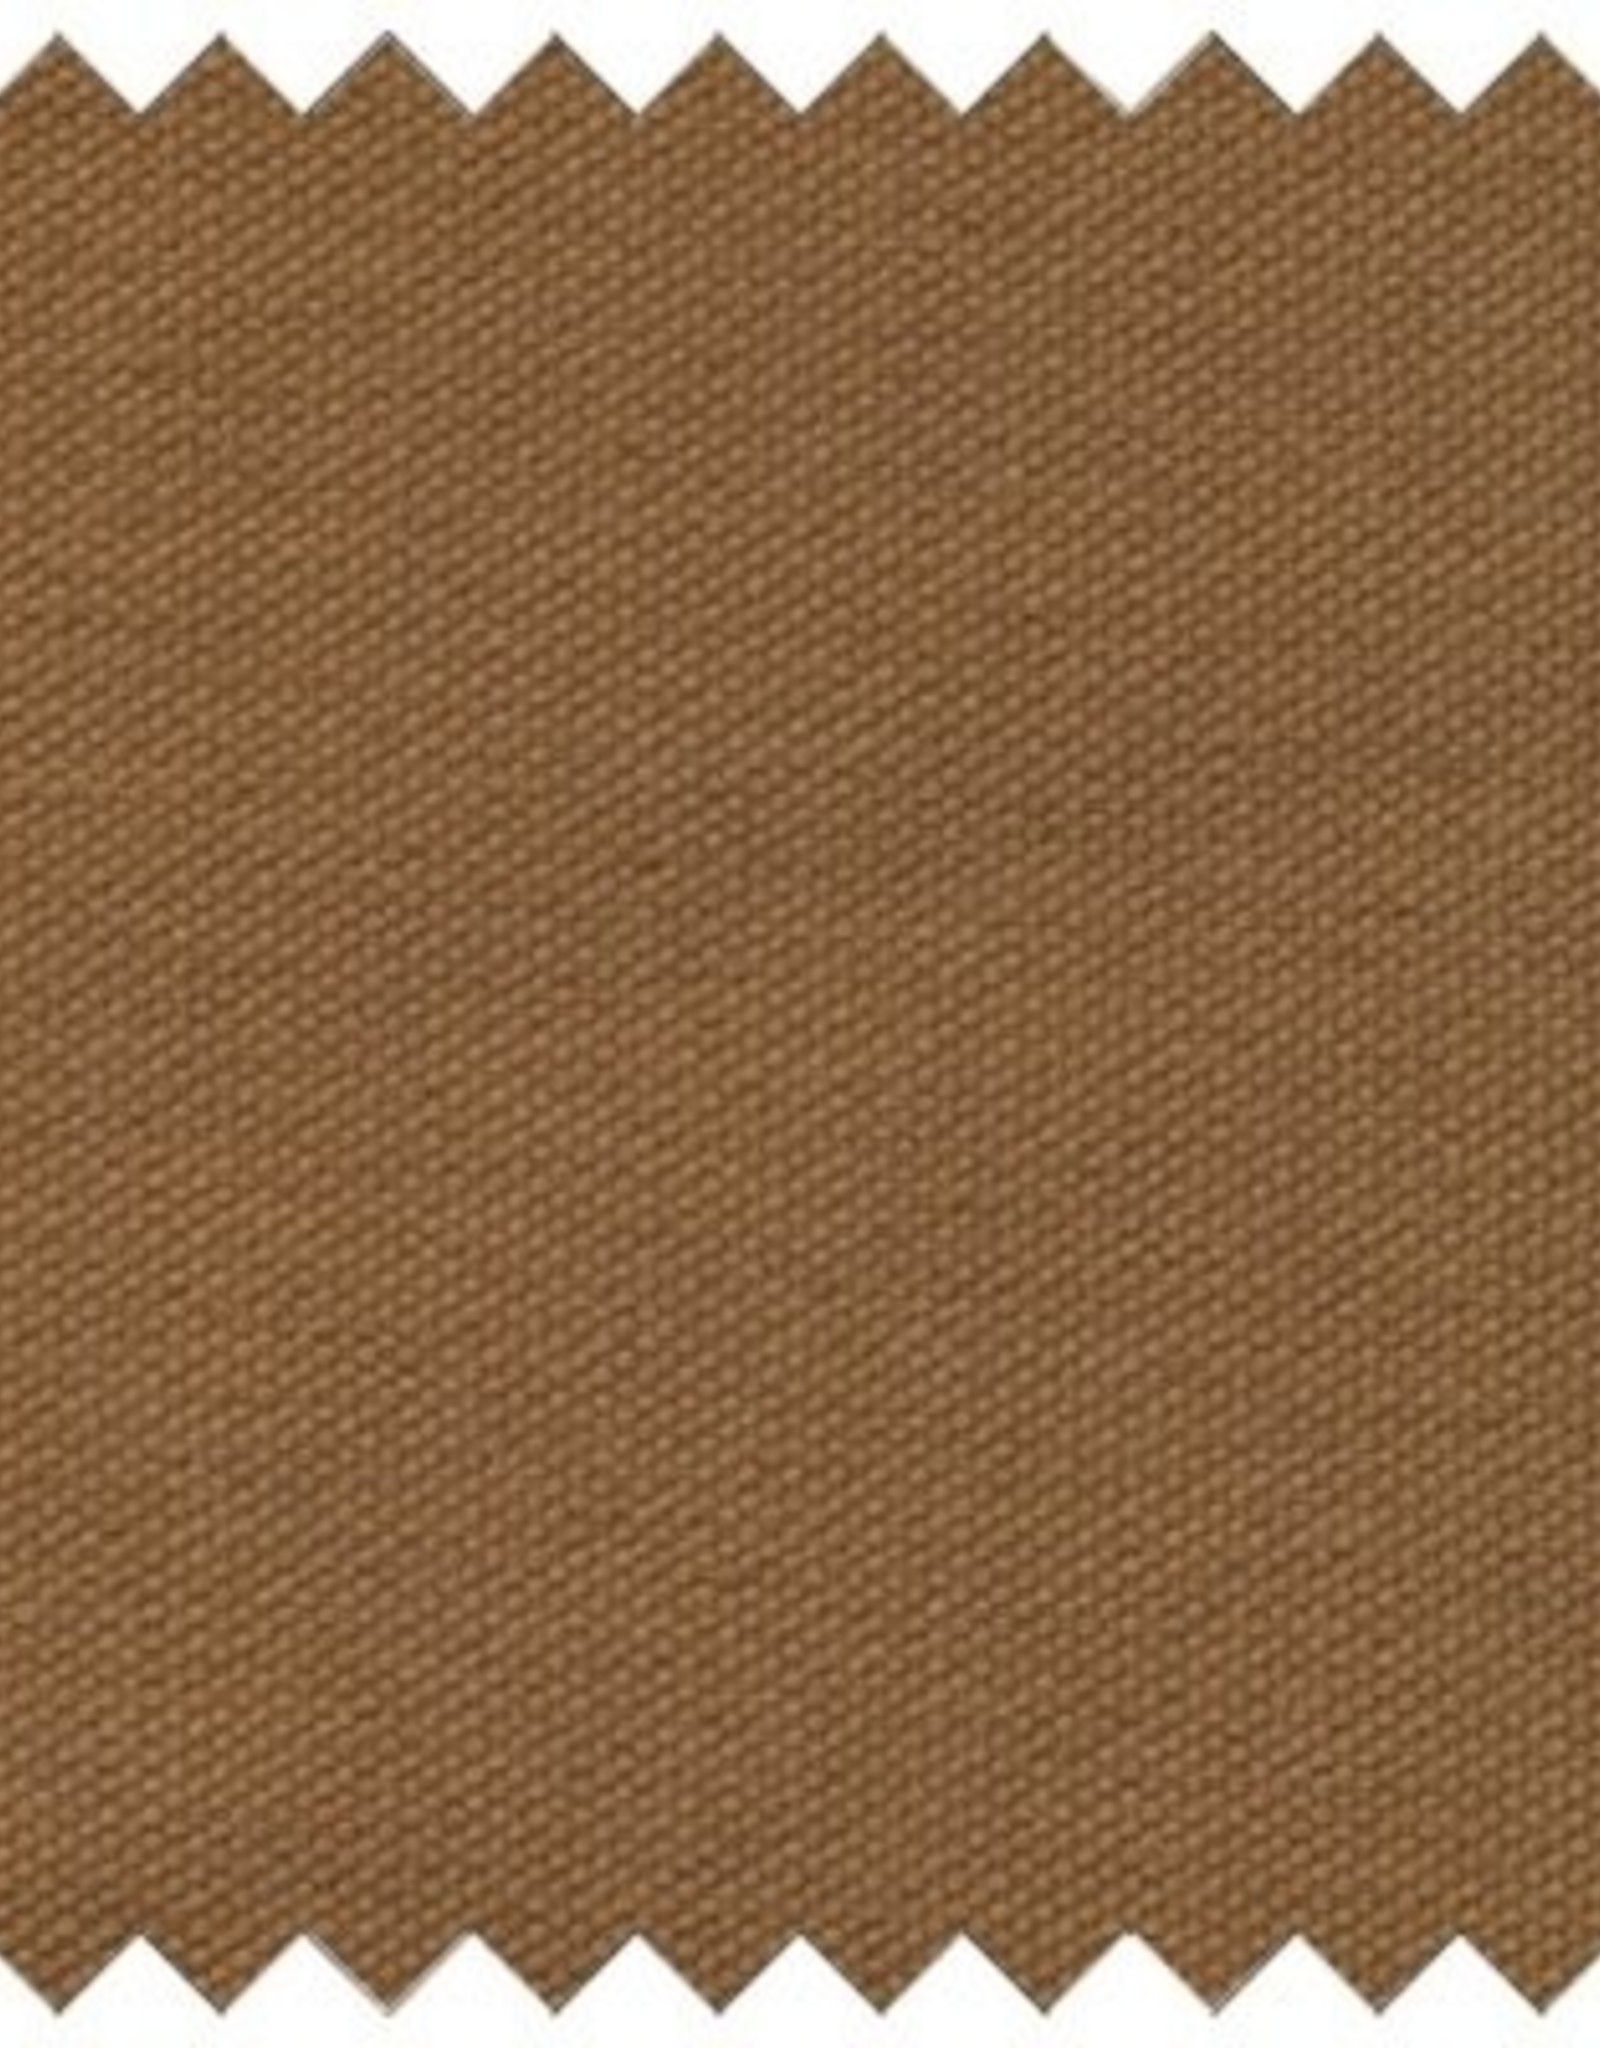 Carolina Morning Designs Rectangular Bolster - Organic Cinnamon